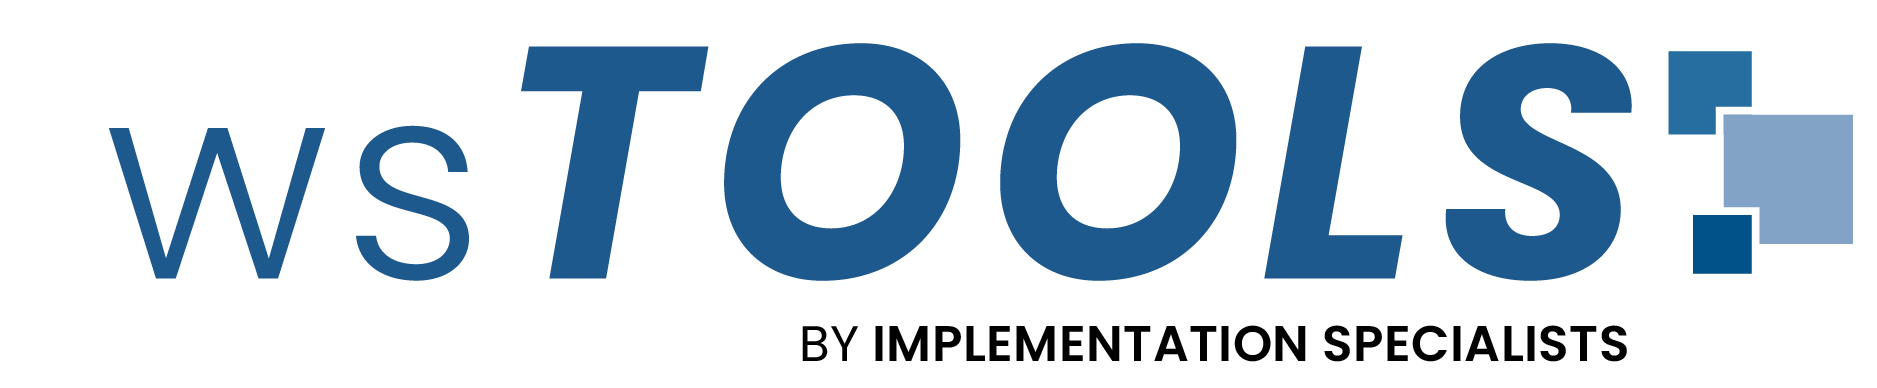 2019 wsTOOLS logo 01